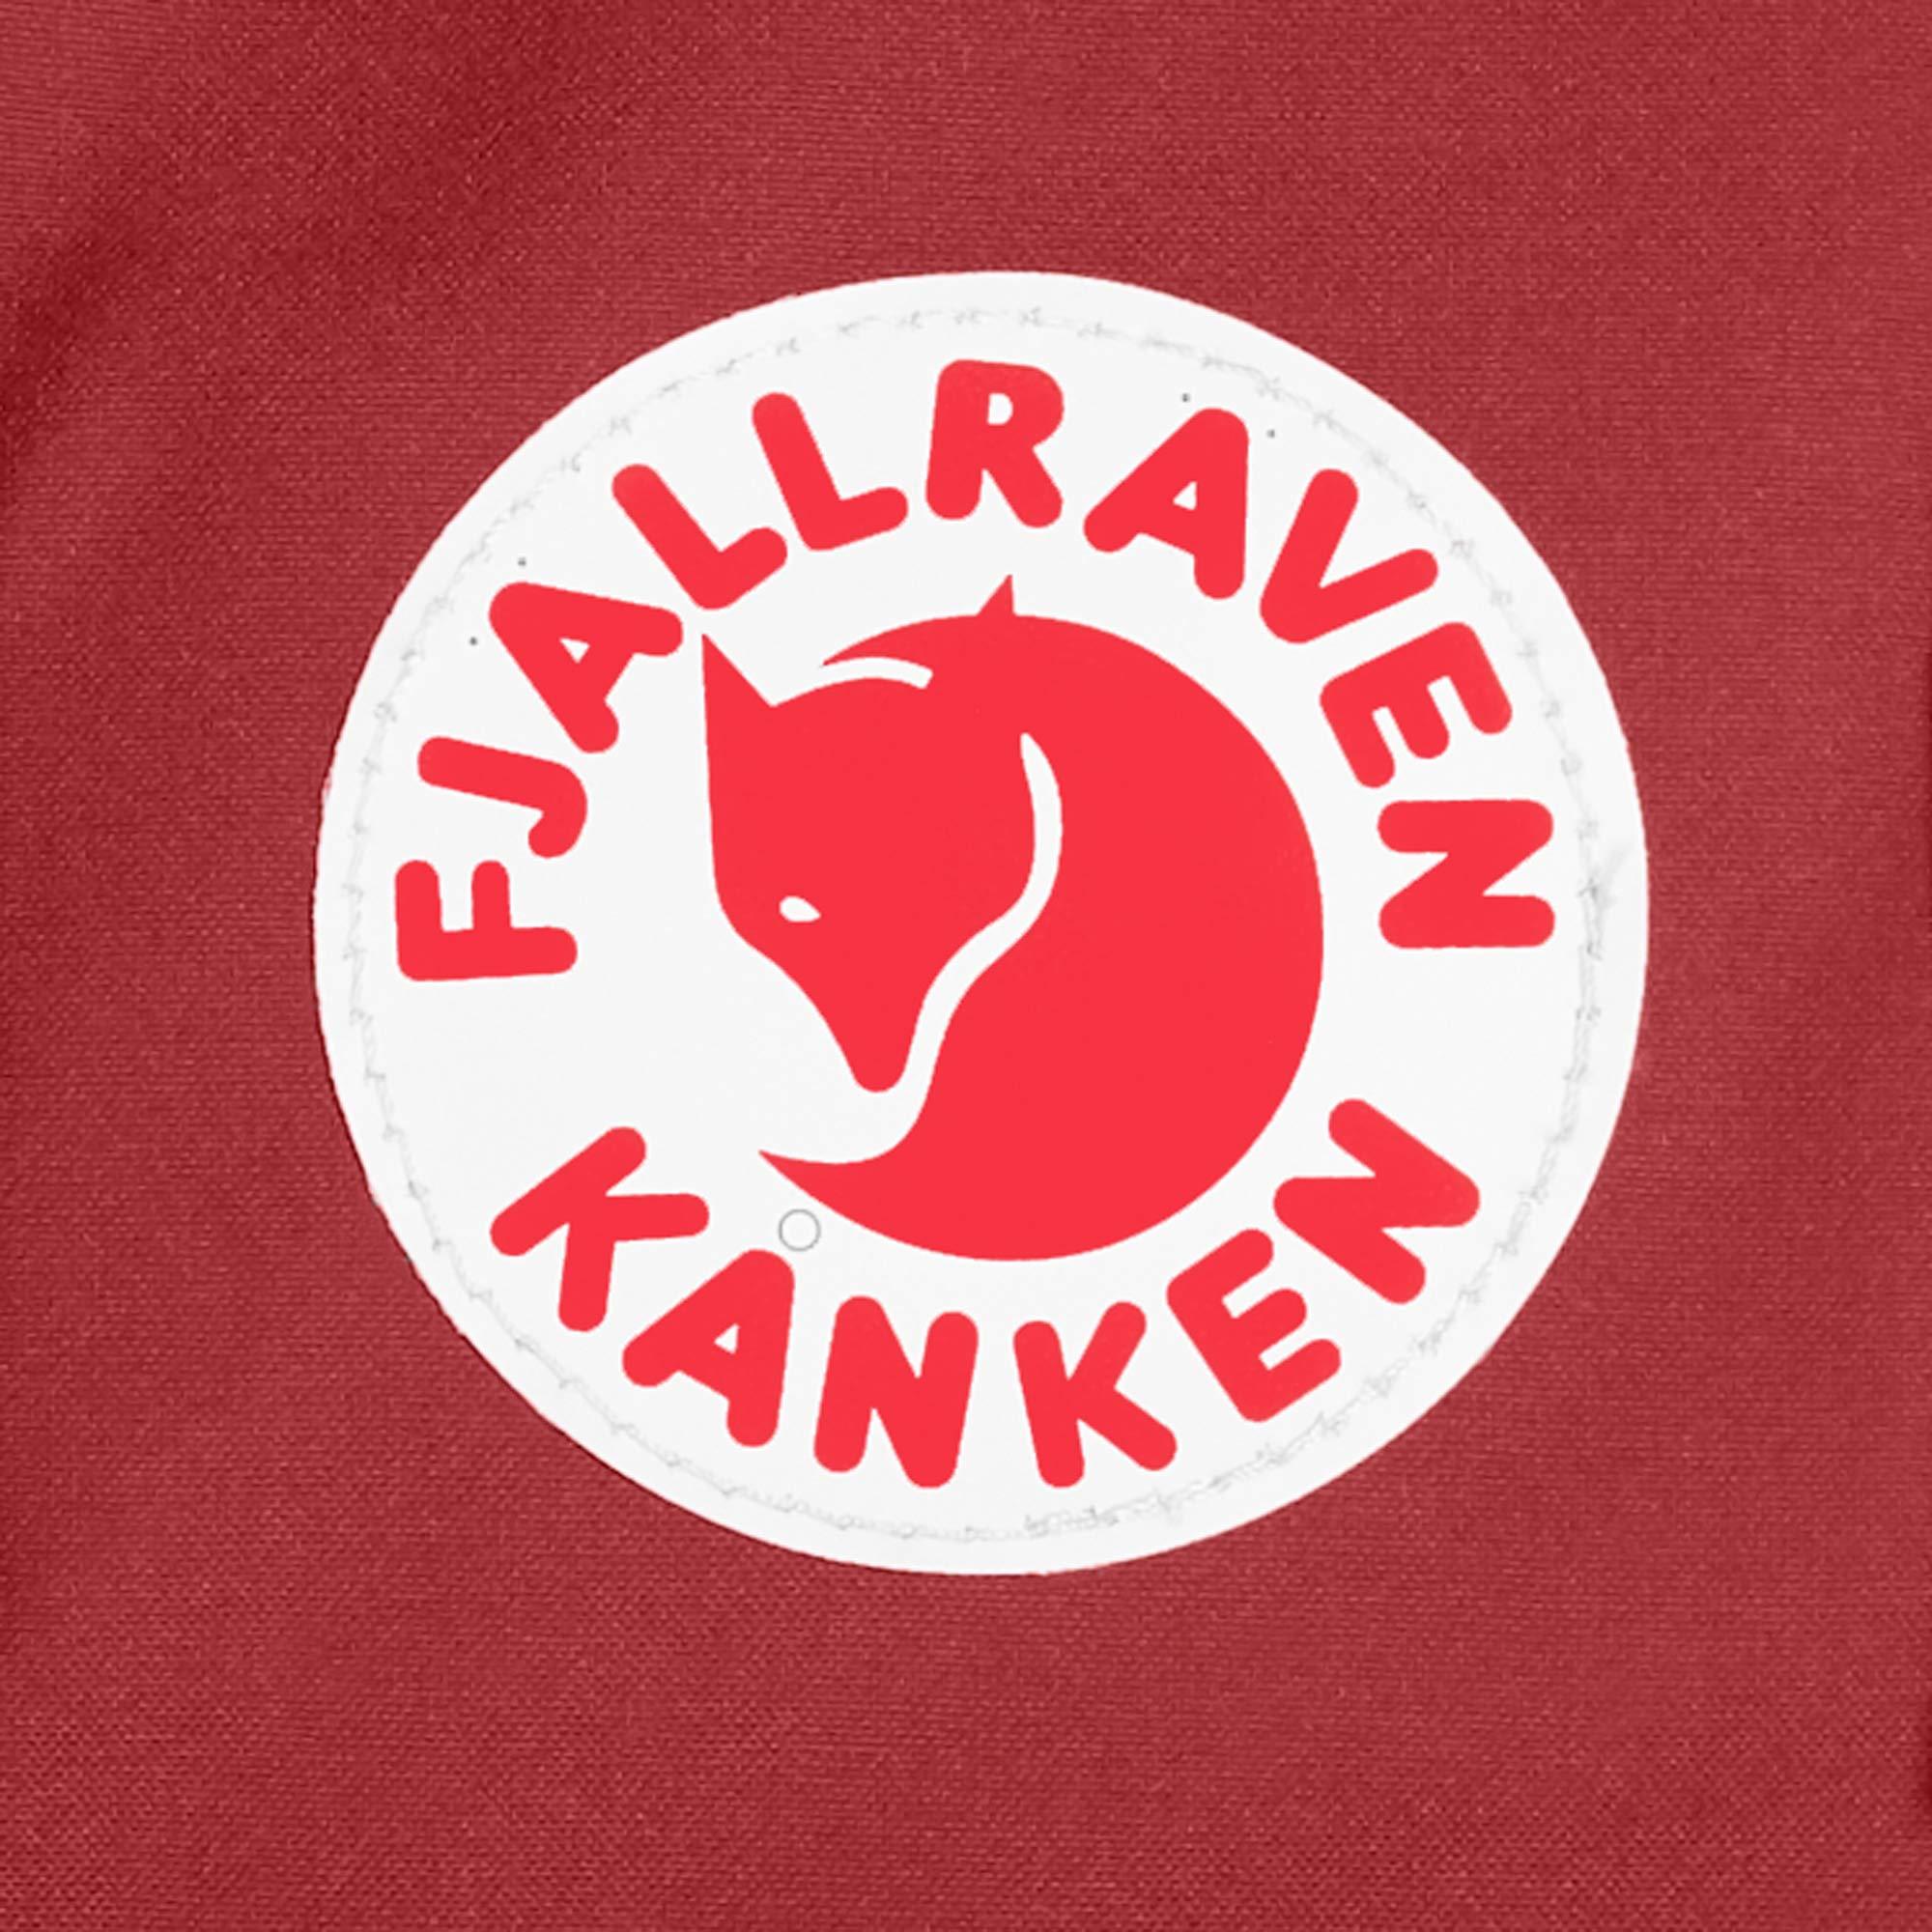 Fjallraven - Kanken Classic Backpack for Everyday, Deep Red by Fjallraven (Image #8)